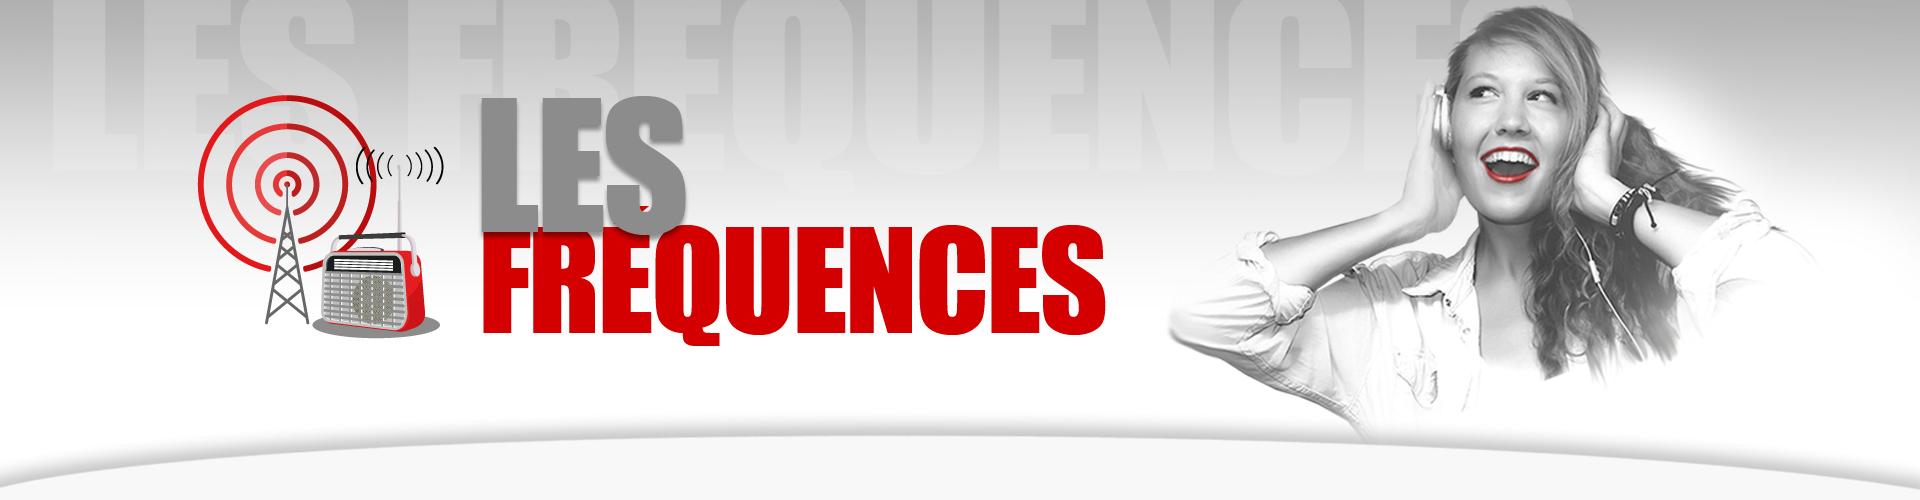 slide-LES-FREQUENCES6